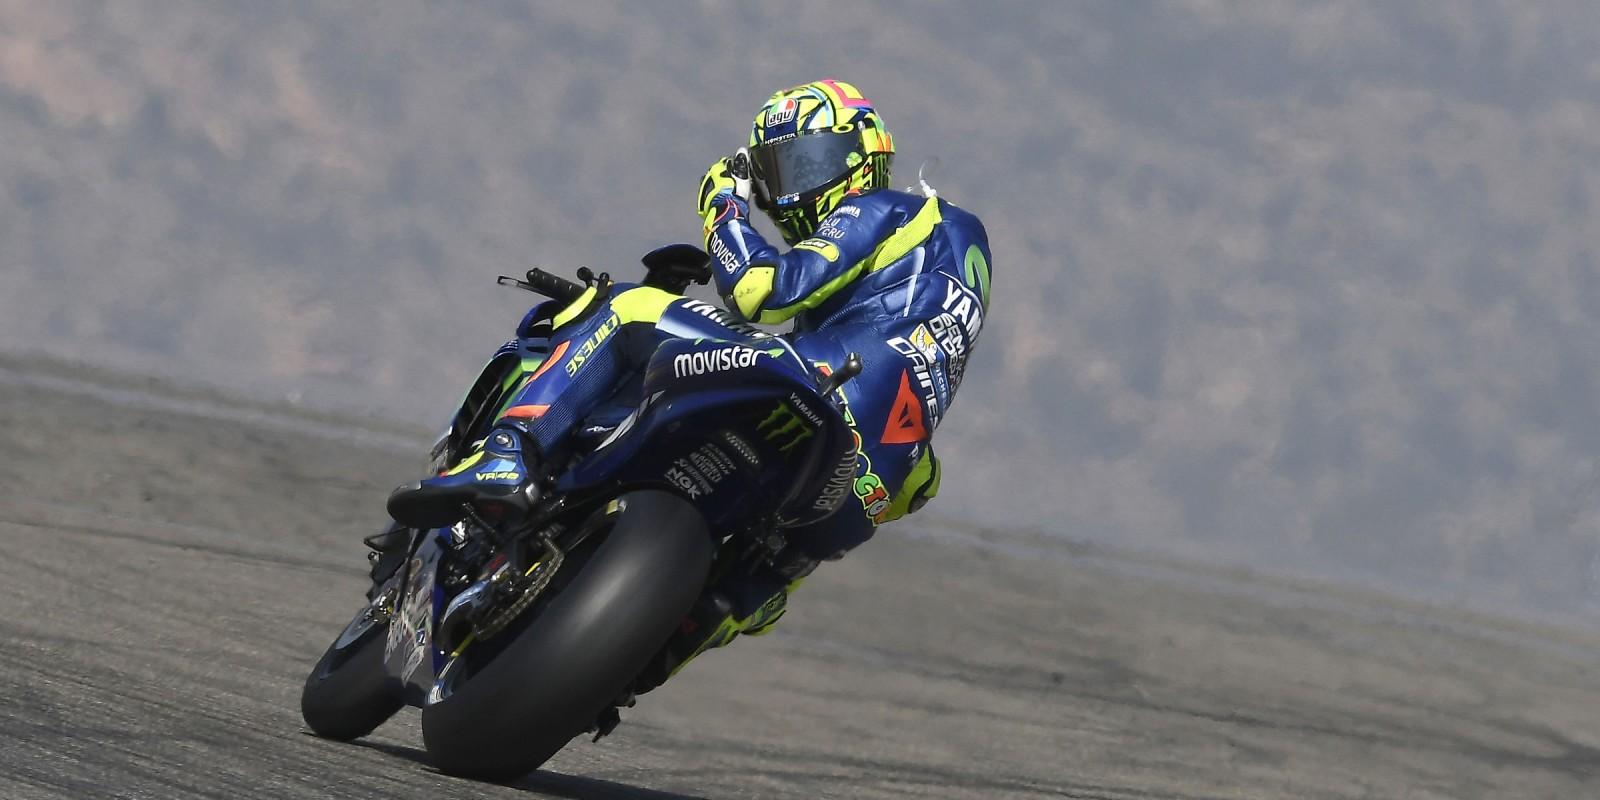 Valentino Rossi at the 2017 GP of Aragon